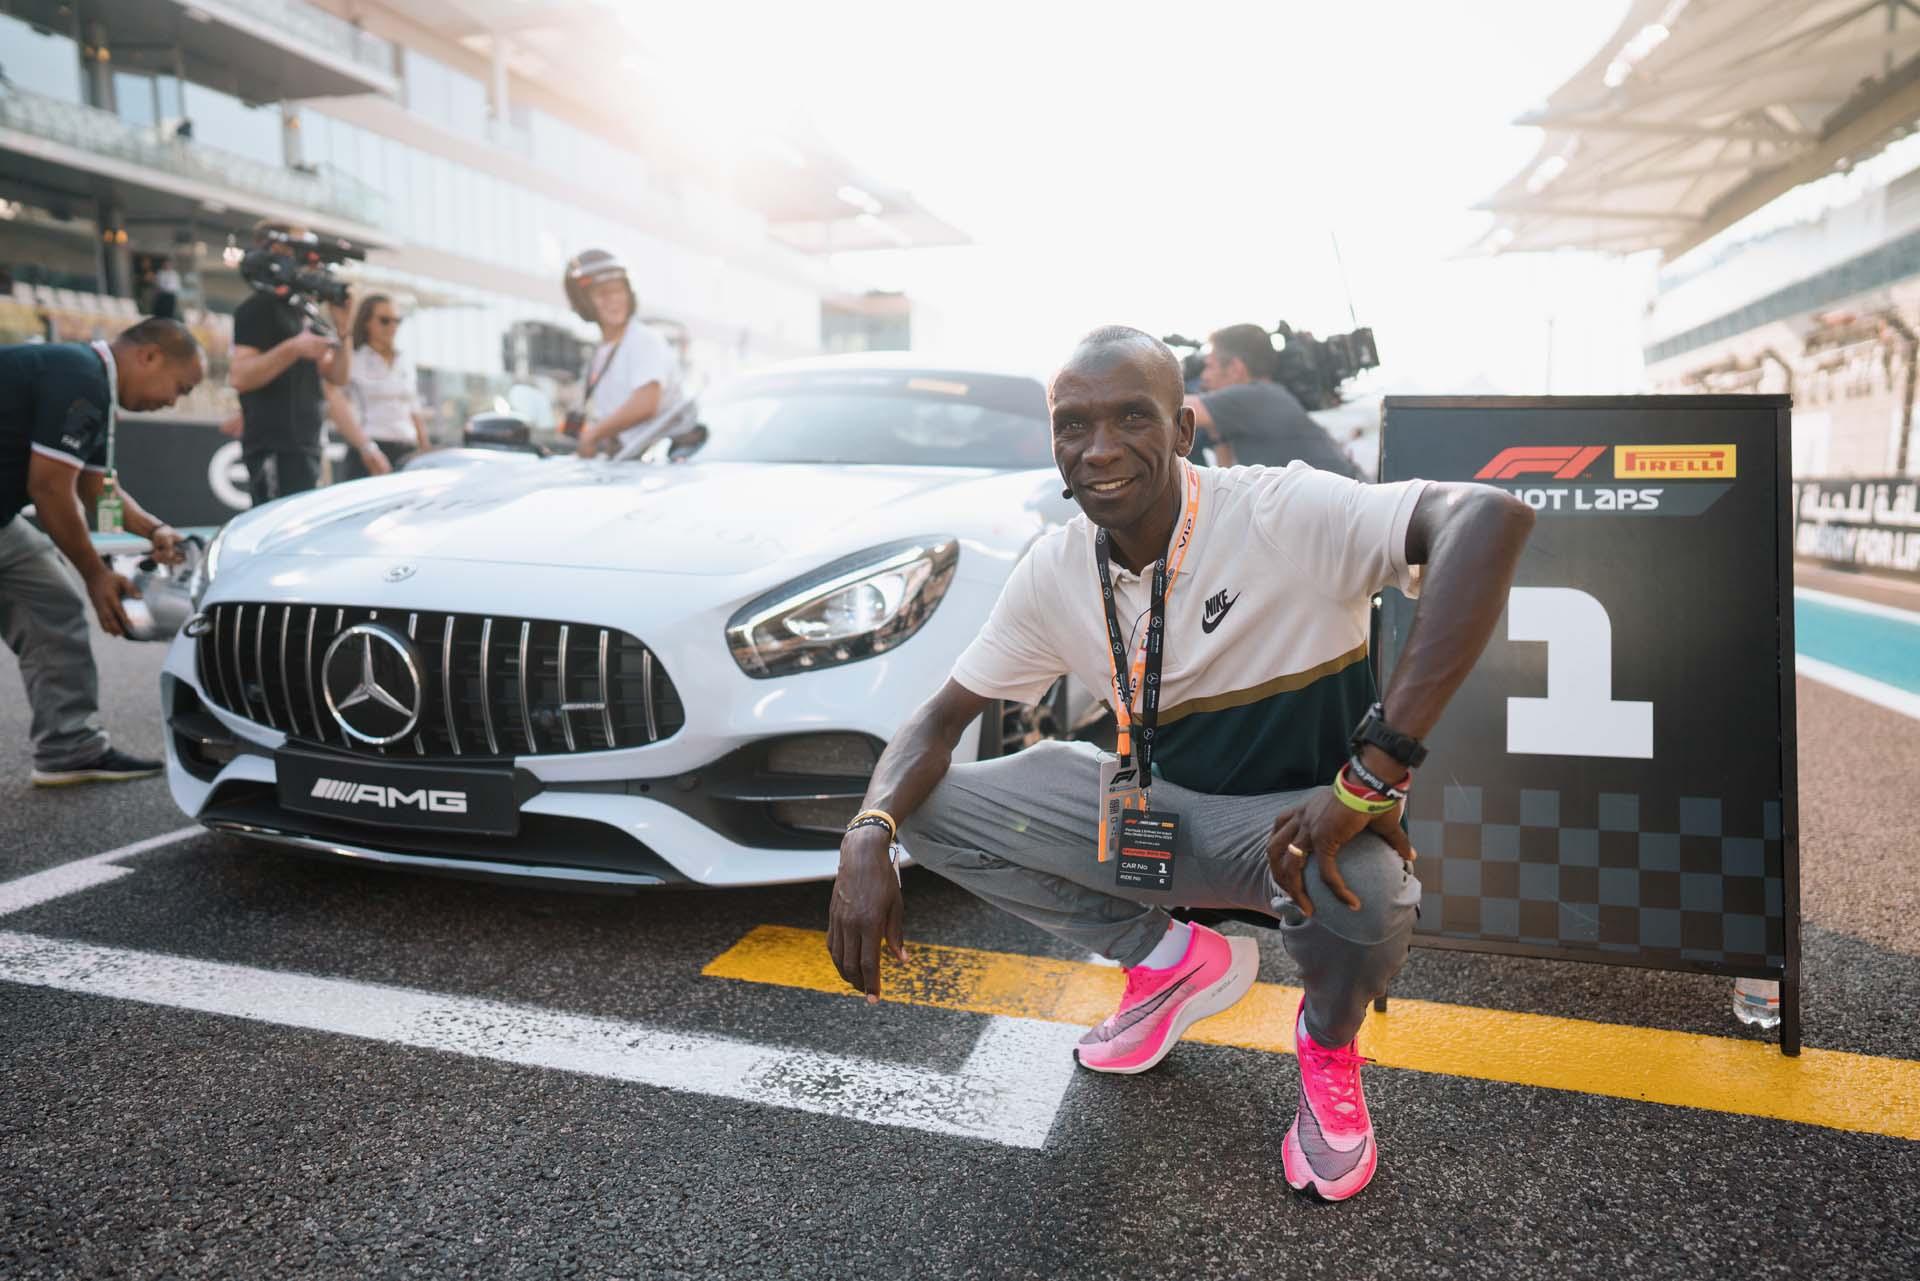 2019 Abu Dhabi Grand Prix, Saturday - Paul Ripke